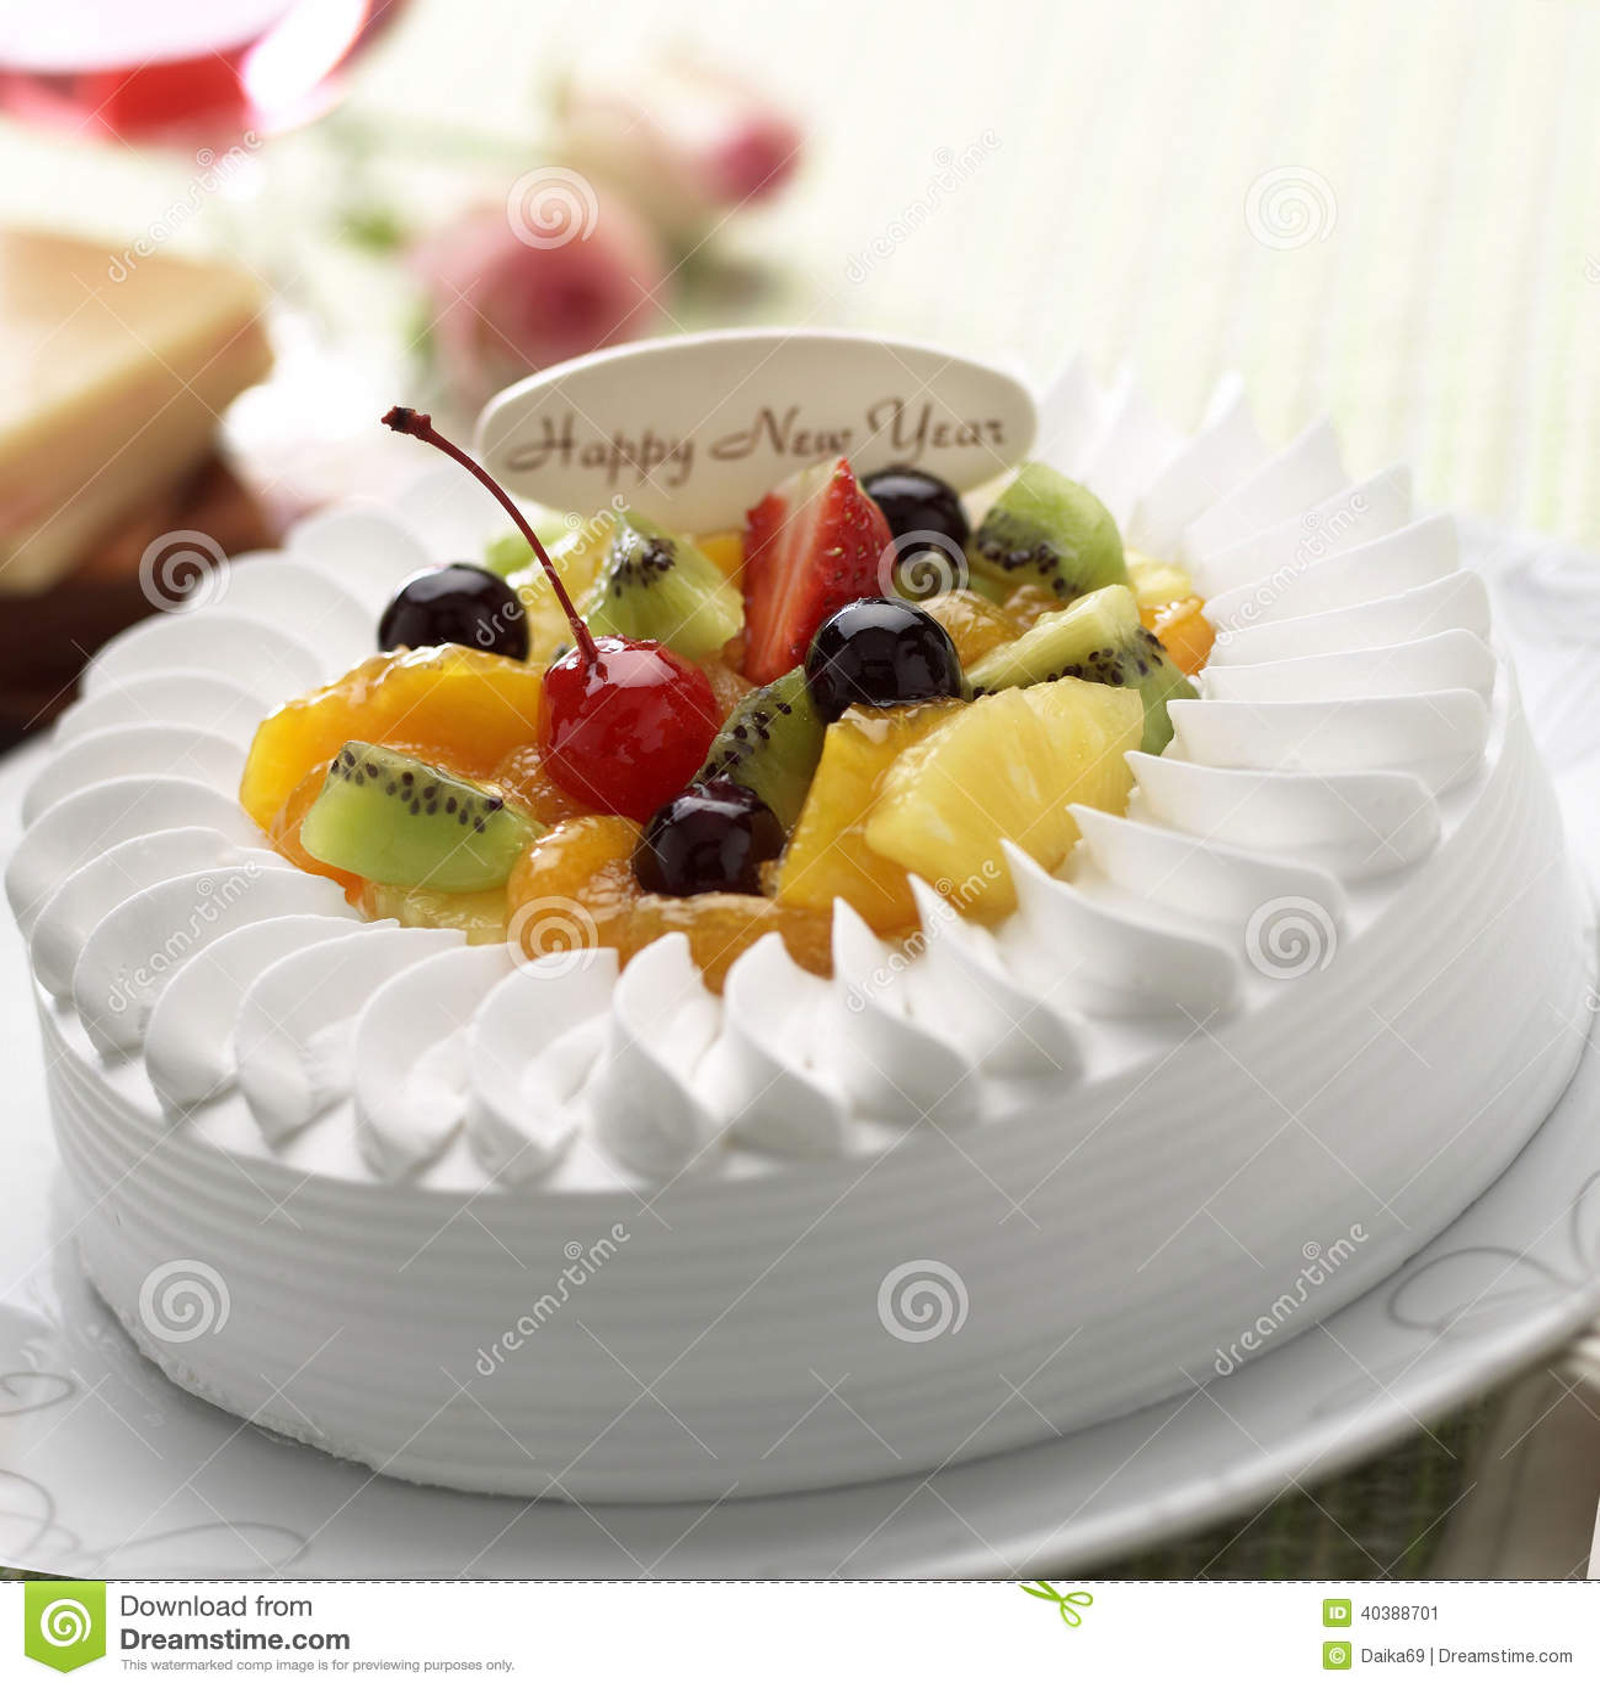 New Year Cake Images Free Download : New year cake stock image. Image of fruit, freshness ...